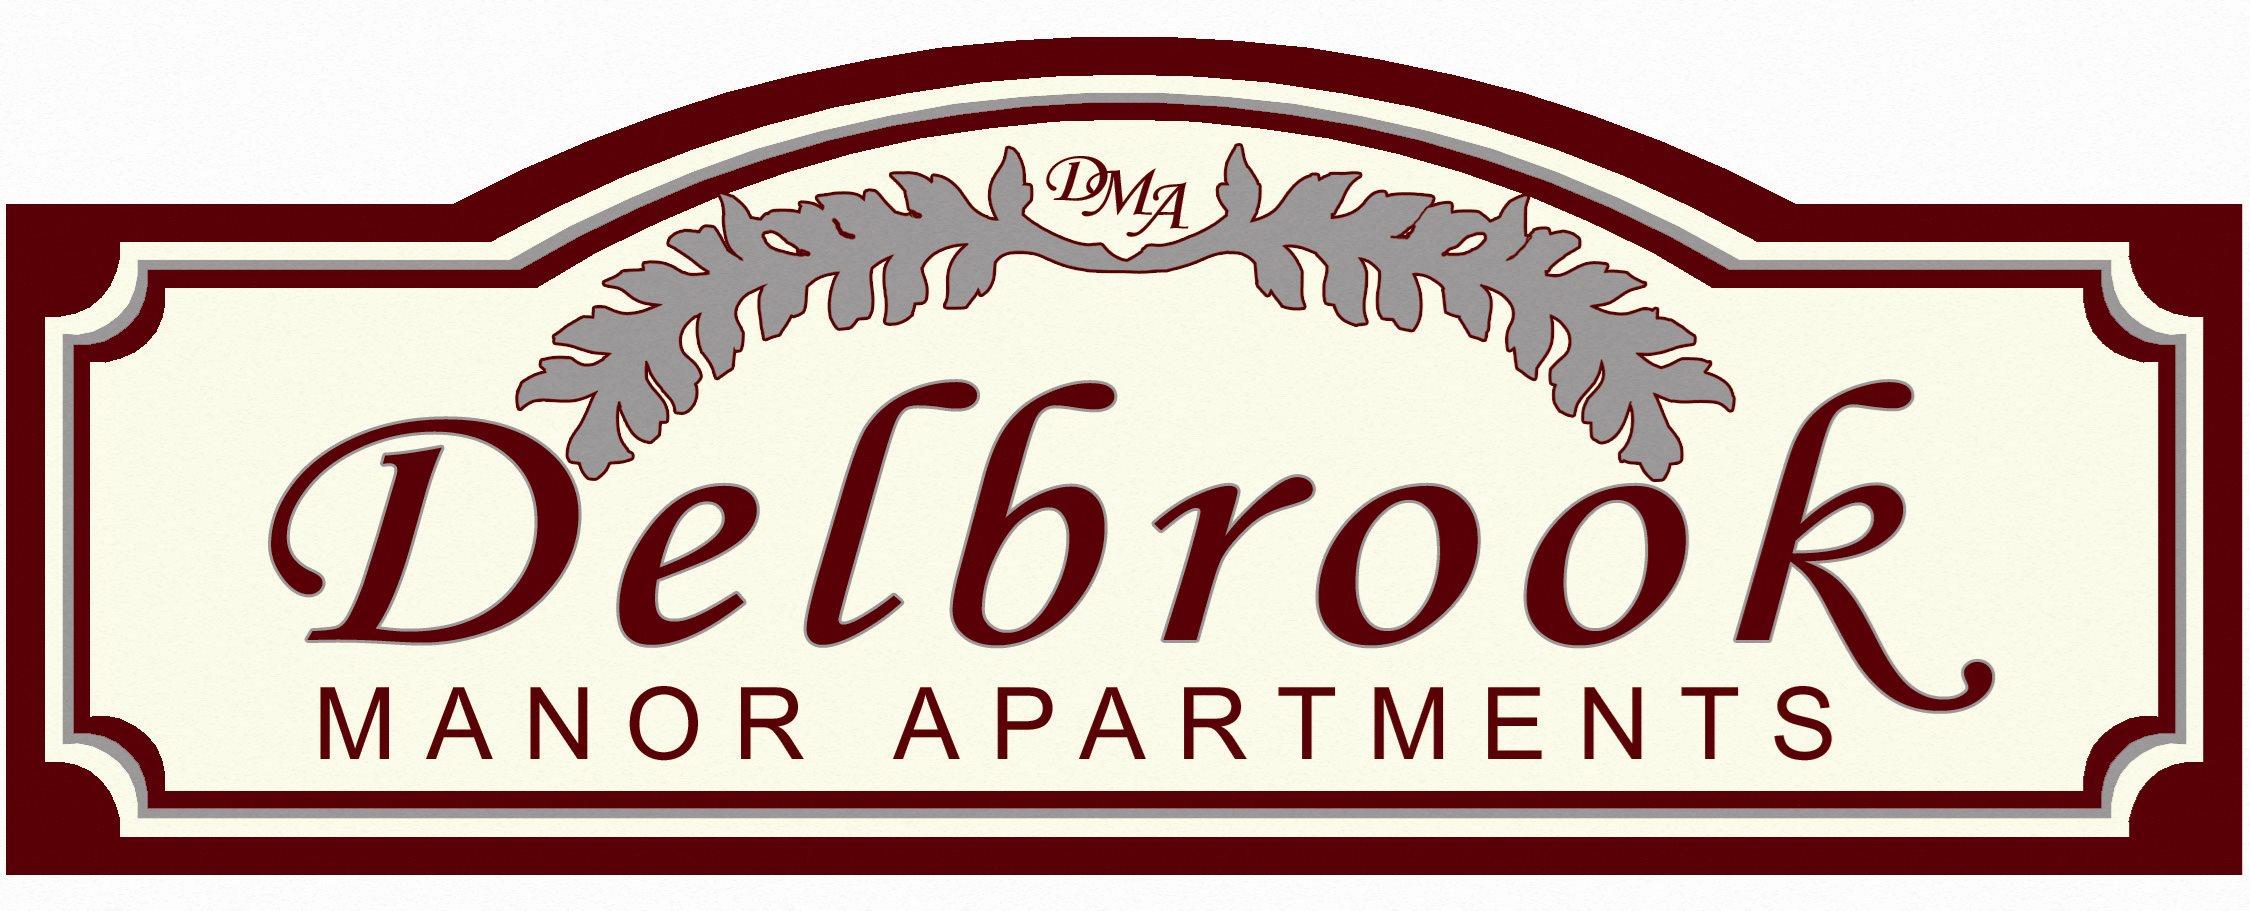 Delbrook Manor Apartments Logo in Mechanicsburg, PA | Delbrook Manor Apartments | Property Management, Inc.